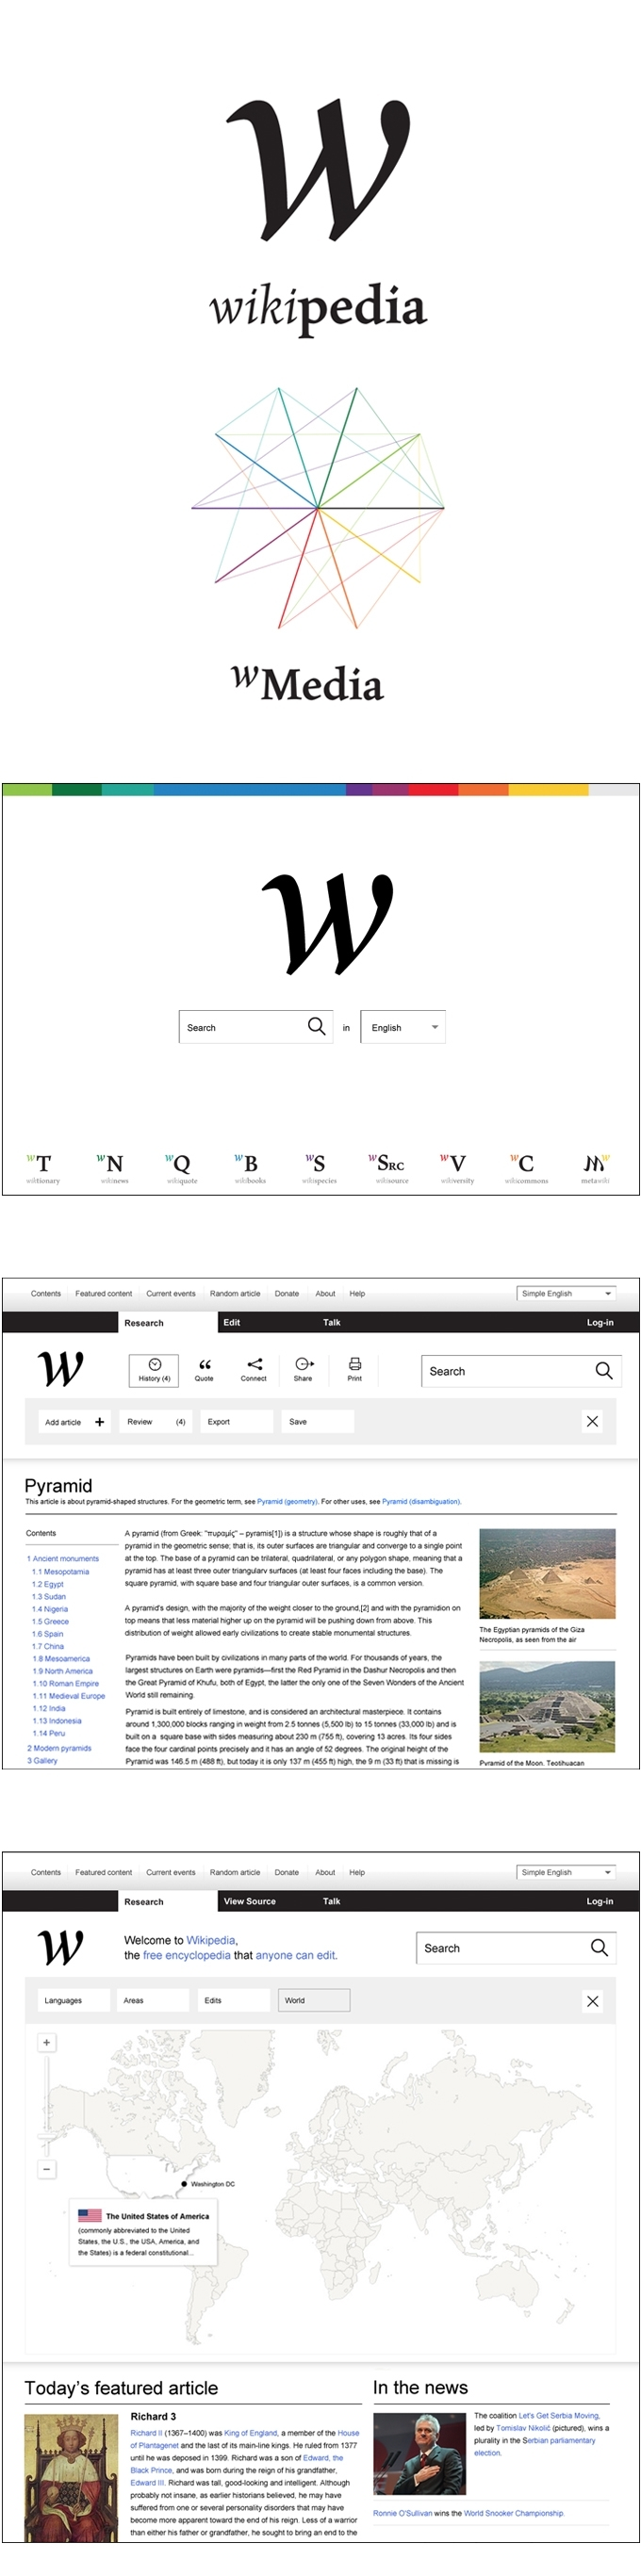 Wikipedia Redefined-large.jpeg